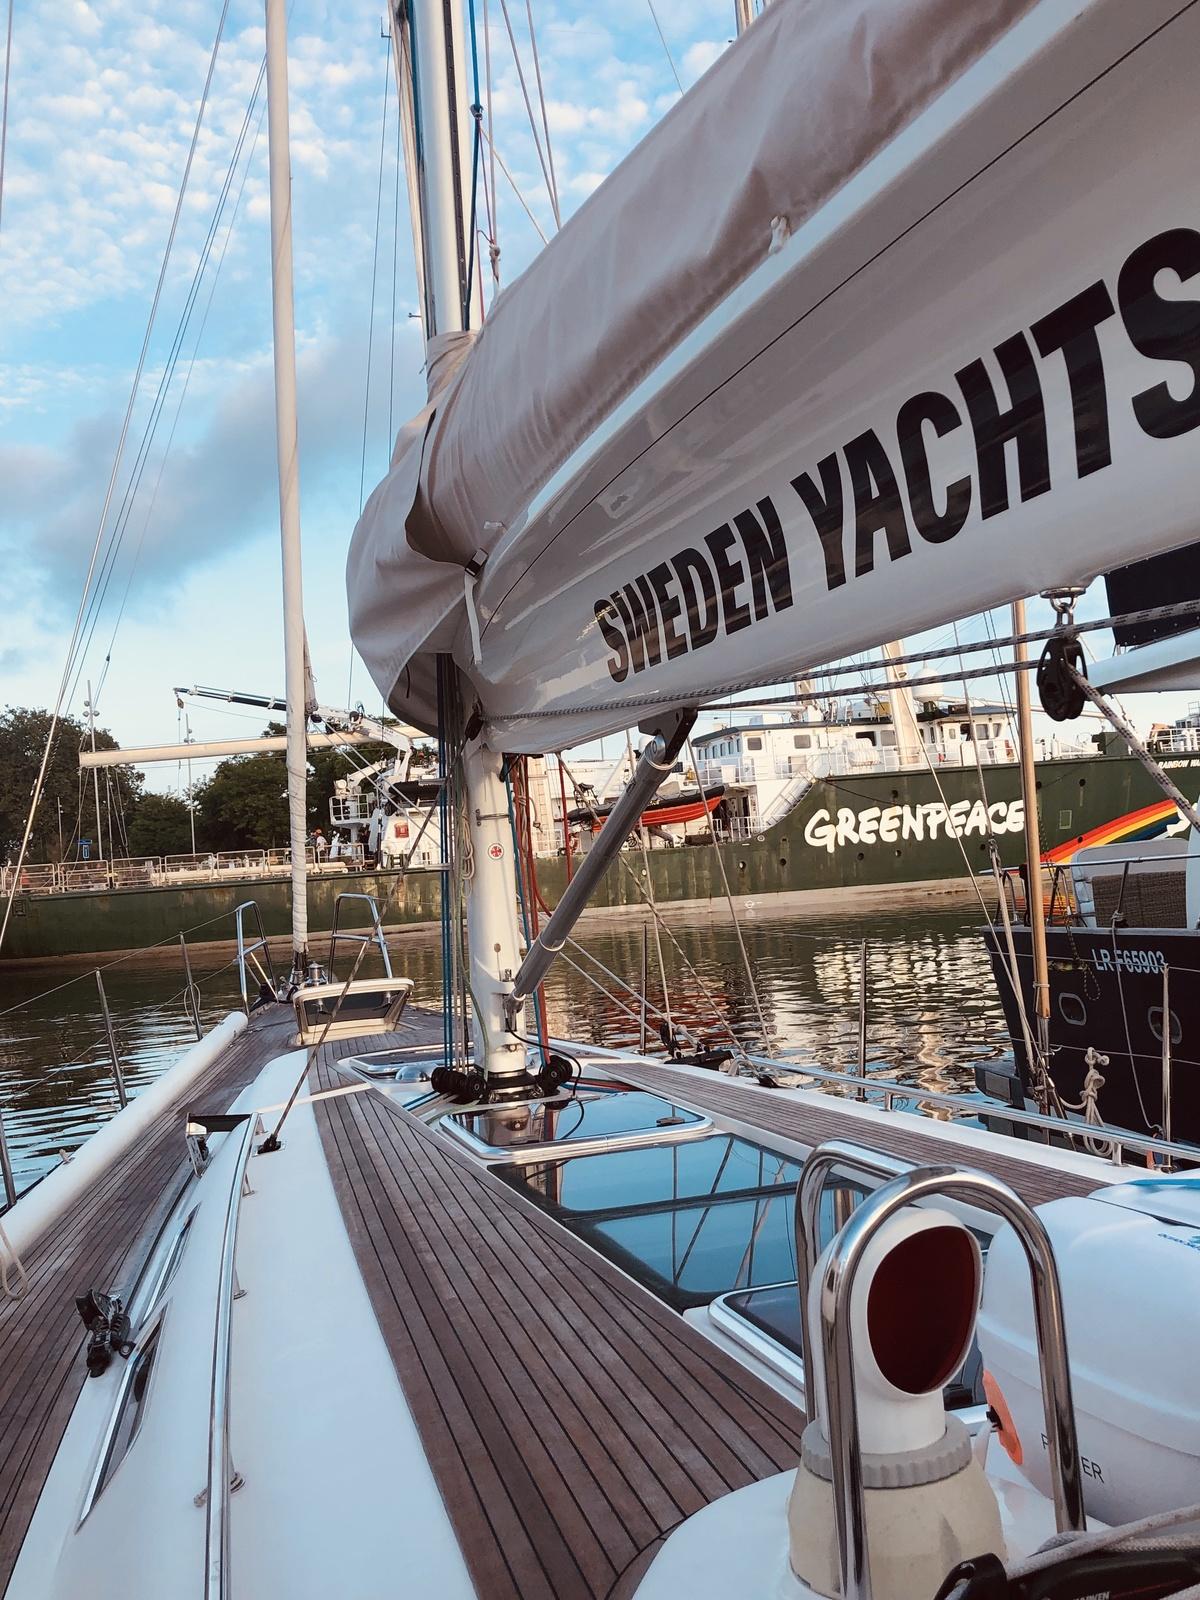 Sweden Yachts